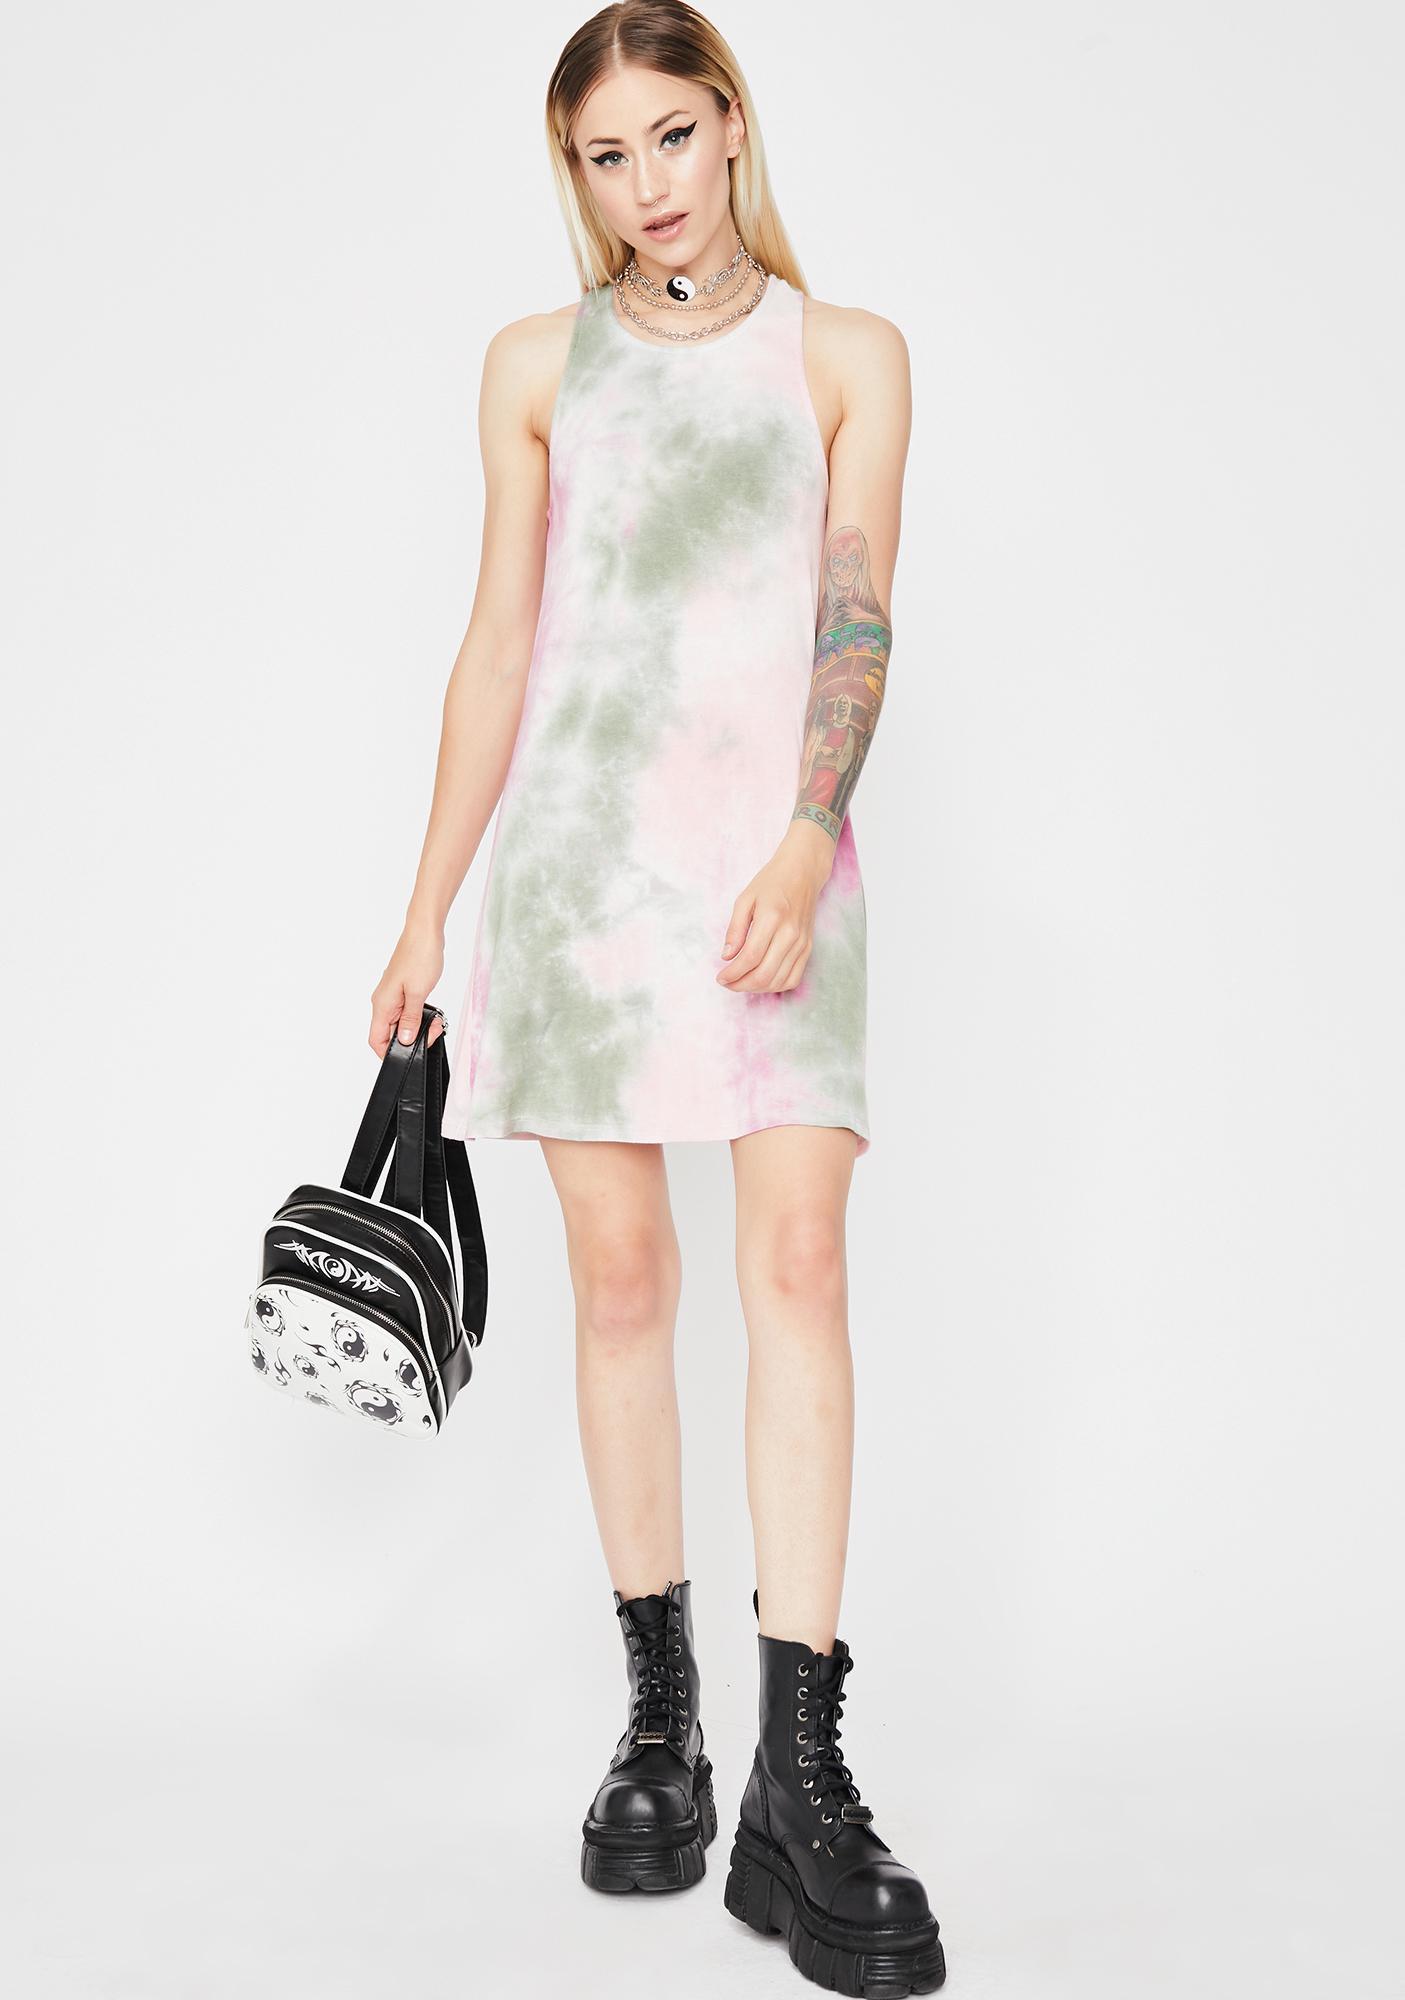 Kush Mixed Feelings Tie Dye Dress